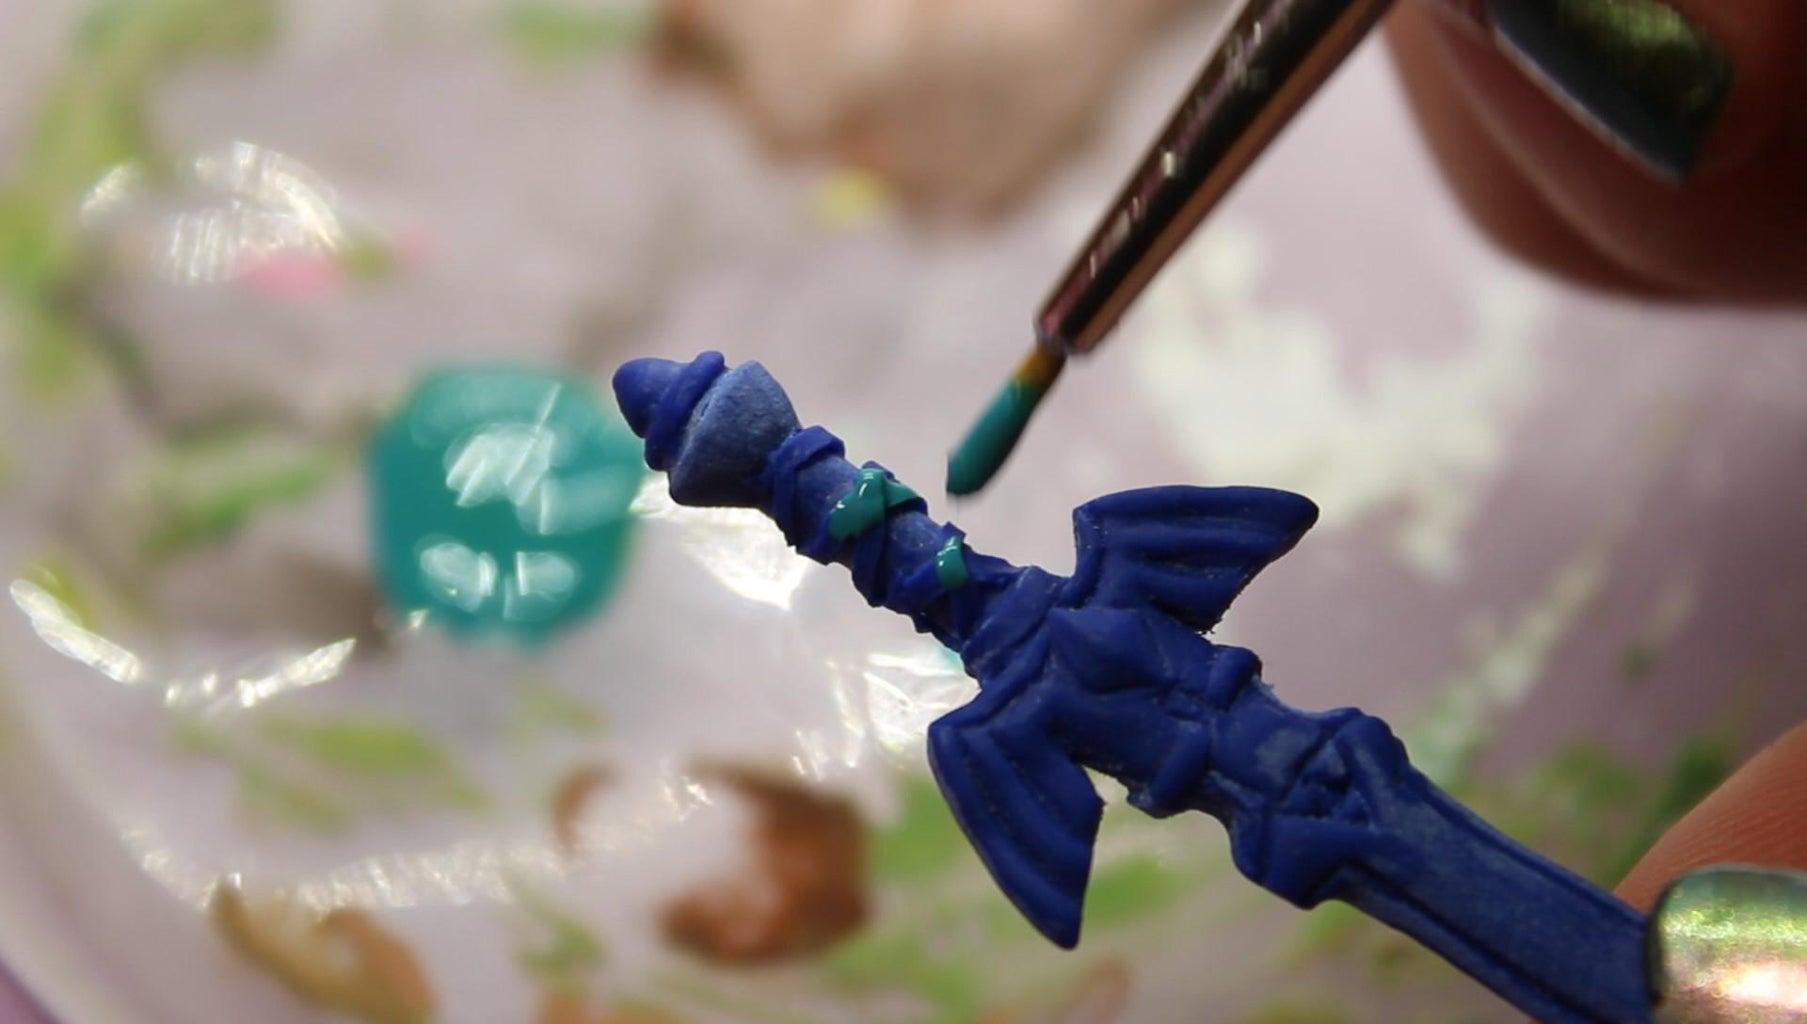 Master Sword: Paint